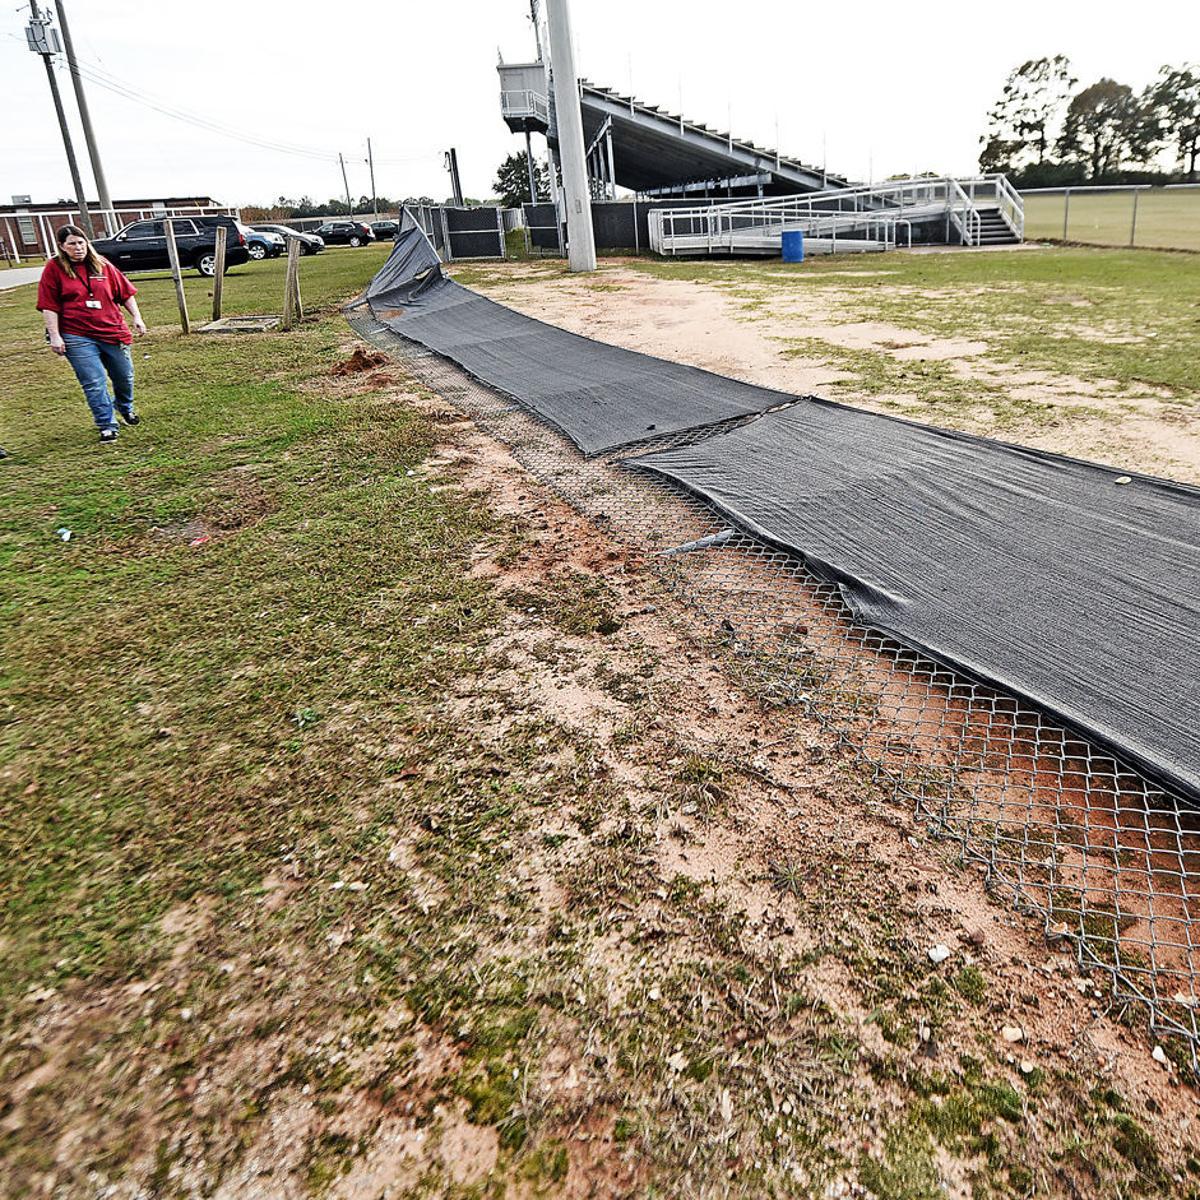 Tornado Confirmed In Western Dothan Wicksburg Houston County Schools Suffer Minor Damage Local News Dothaneagle Com